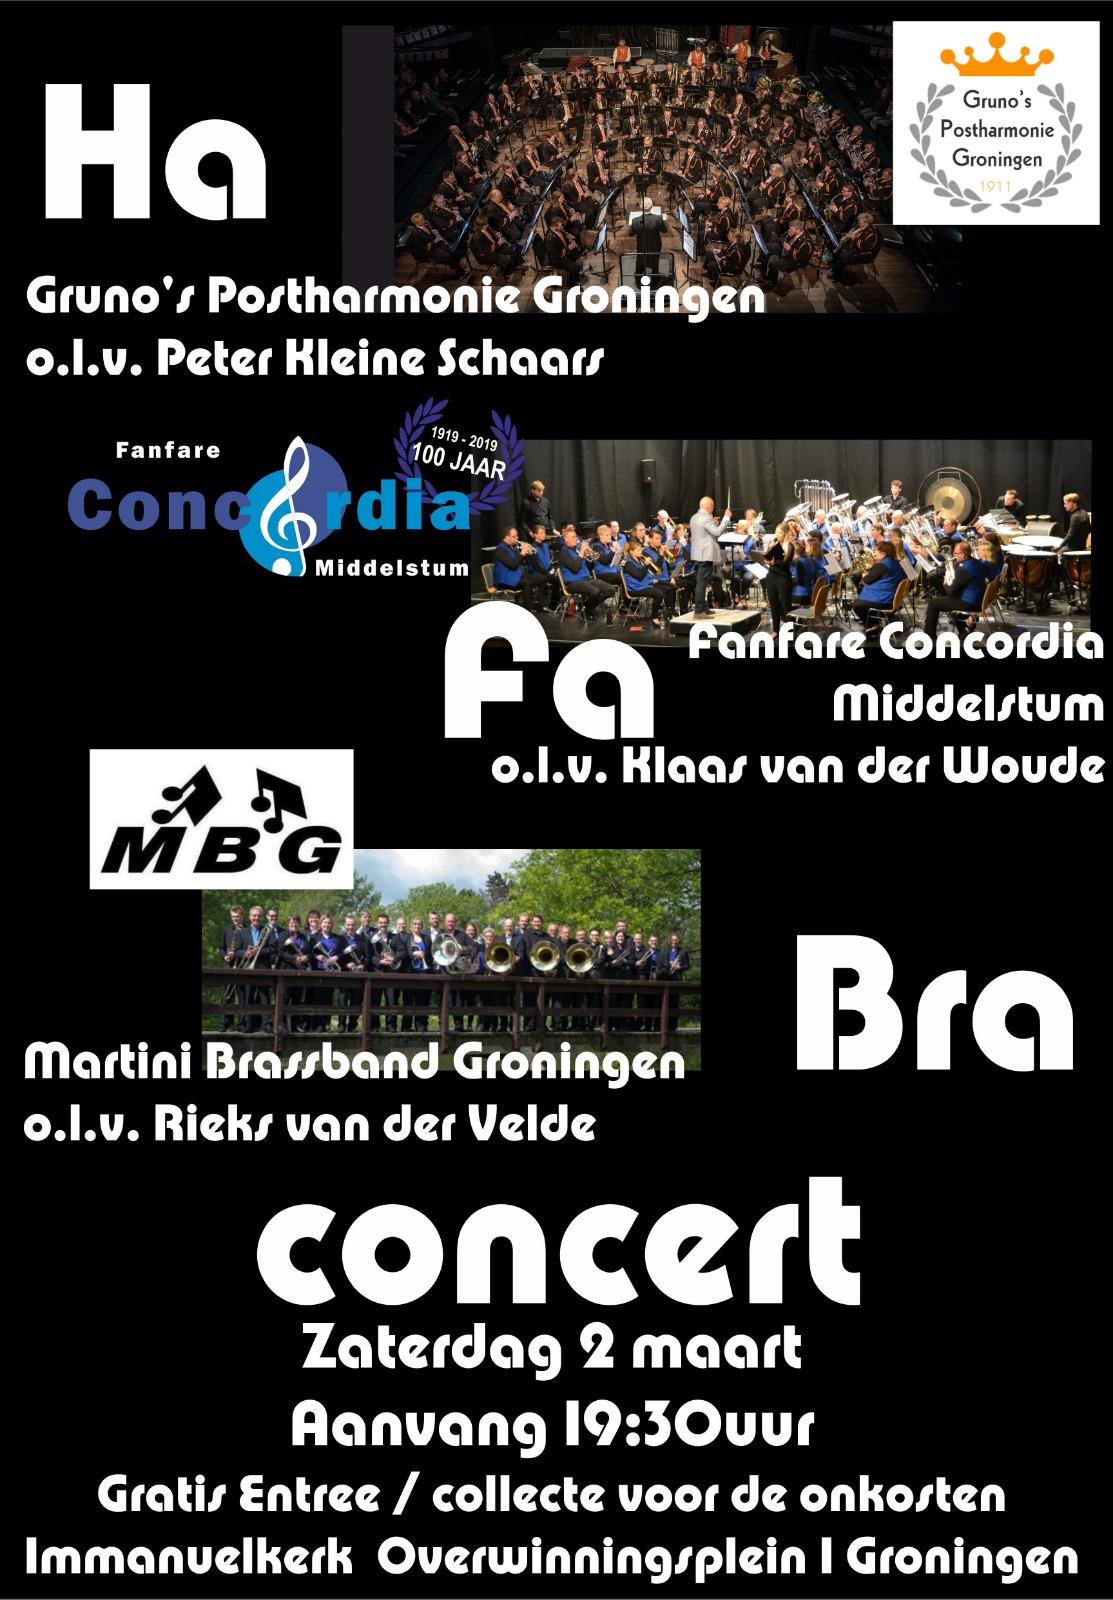 Gruno's Postharmonie 2 maart